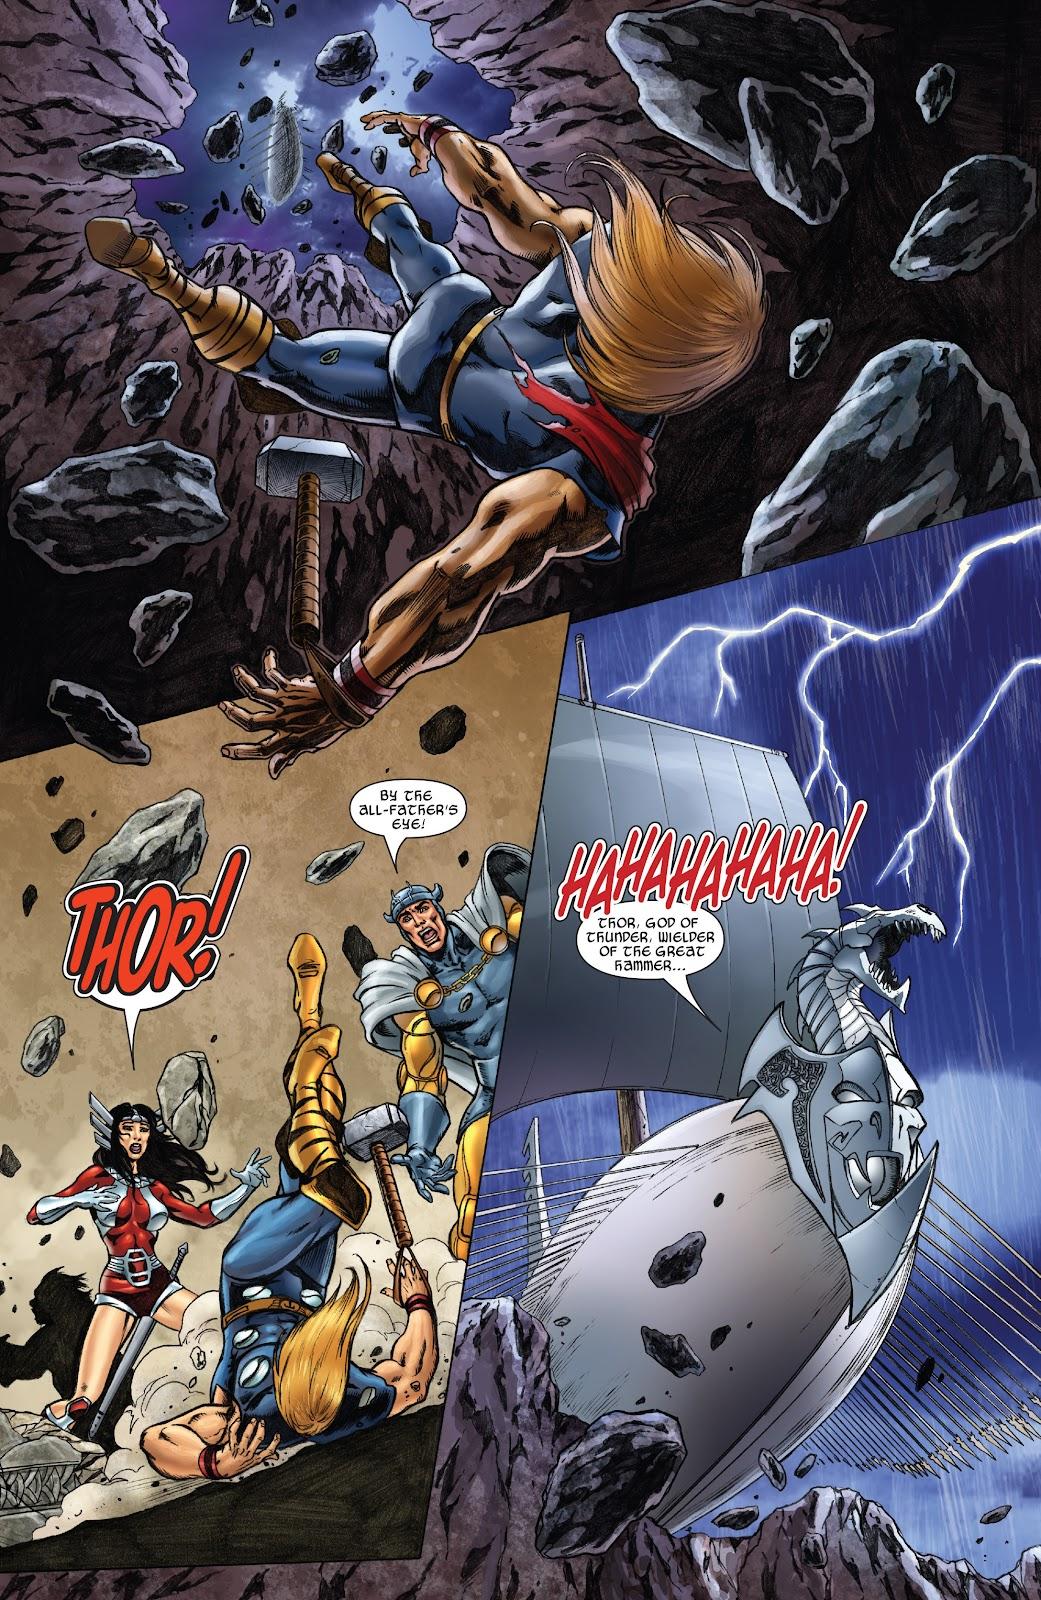 Read online Thor: Ragnaroks comic -  Issue # TPB (Part 2) - 40